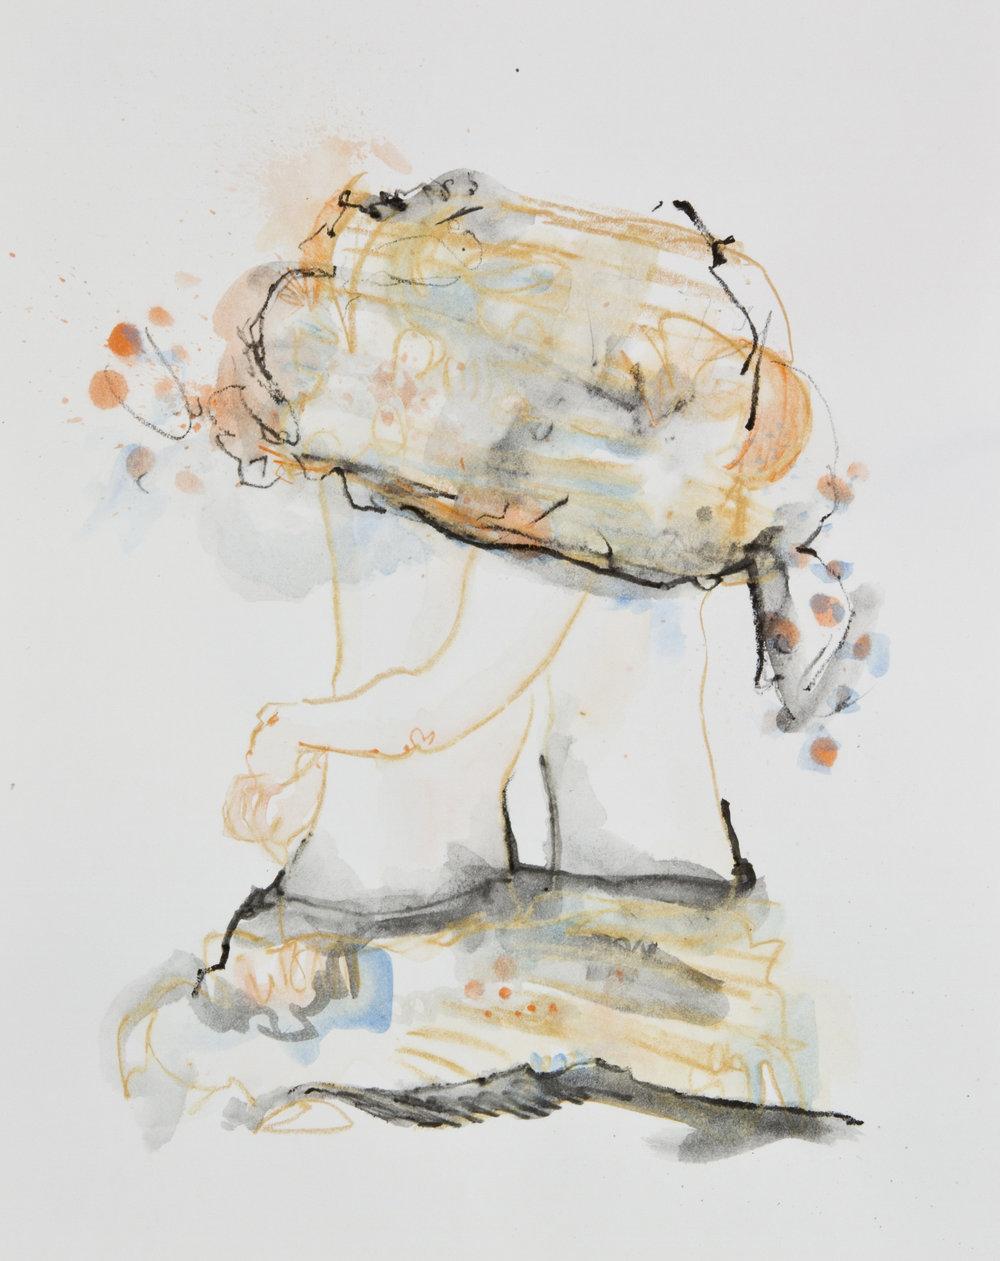 Orange Crush, 2013, graphite, crayon and watercolor pencil on paper, 11x14 inches